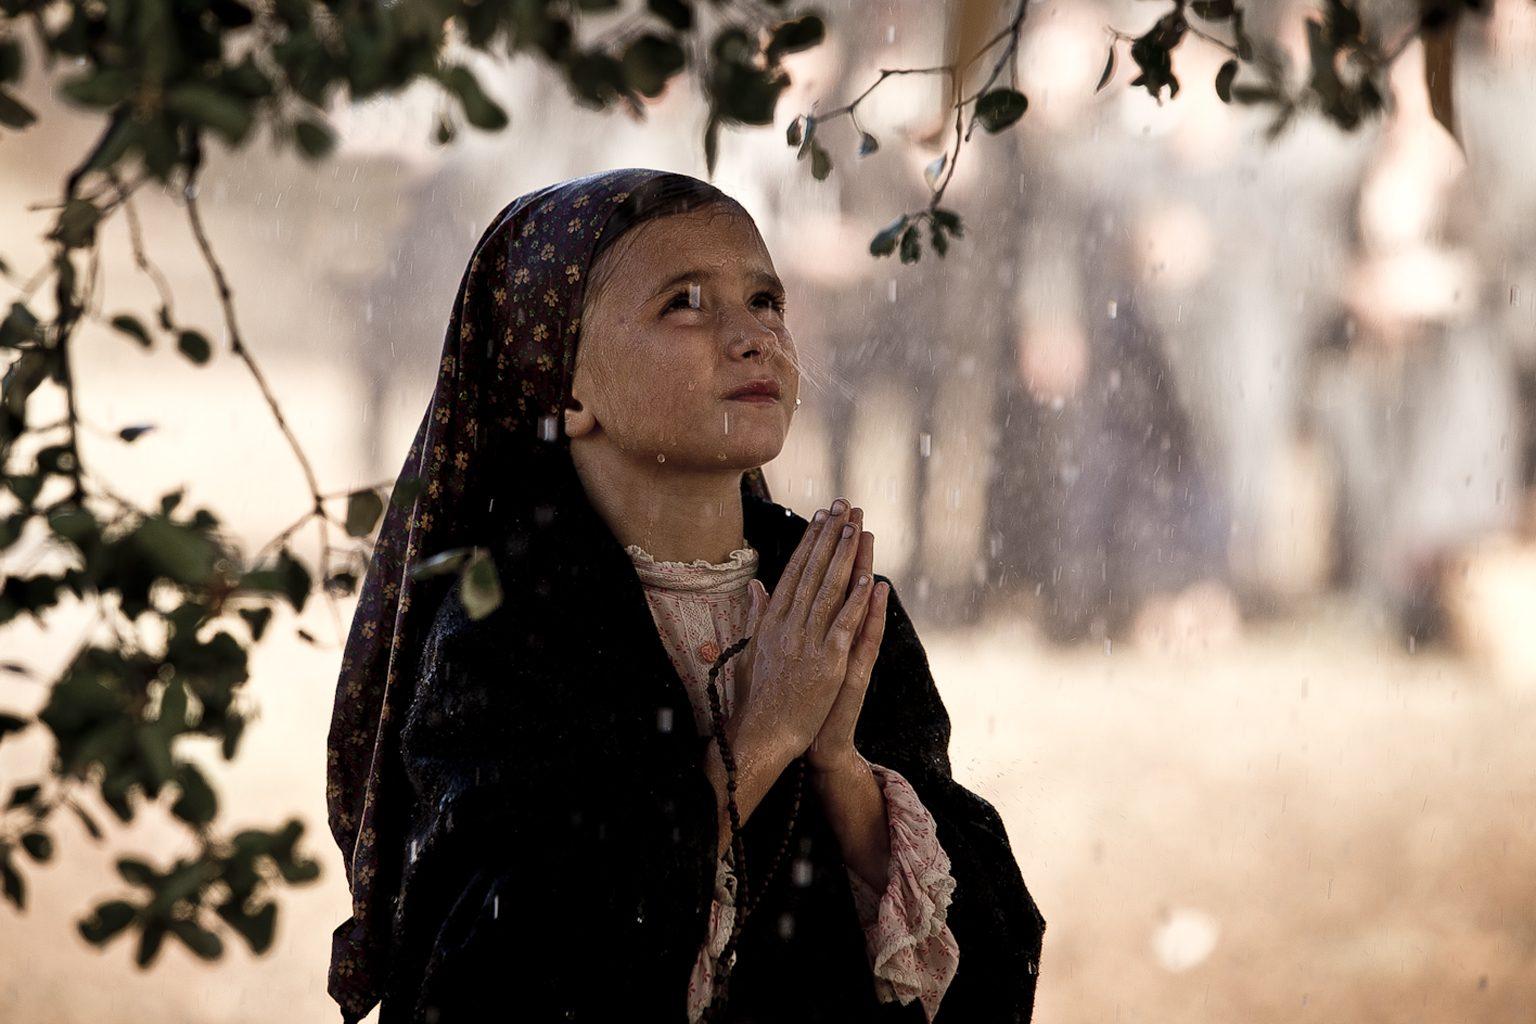 Matilde Serrão interpreta Jacinta de Jesus Marto